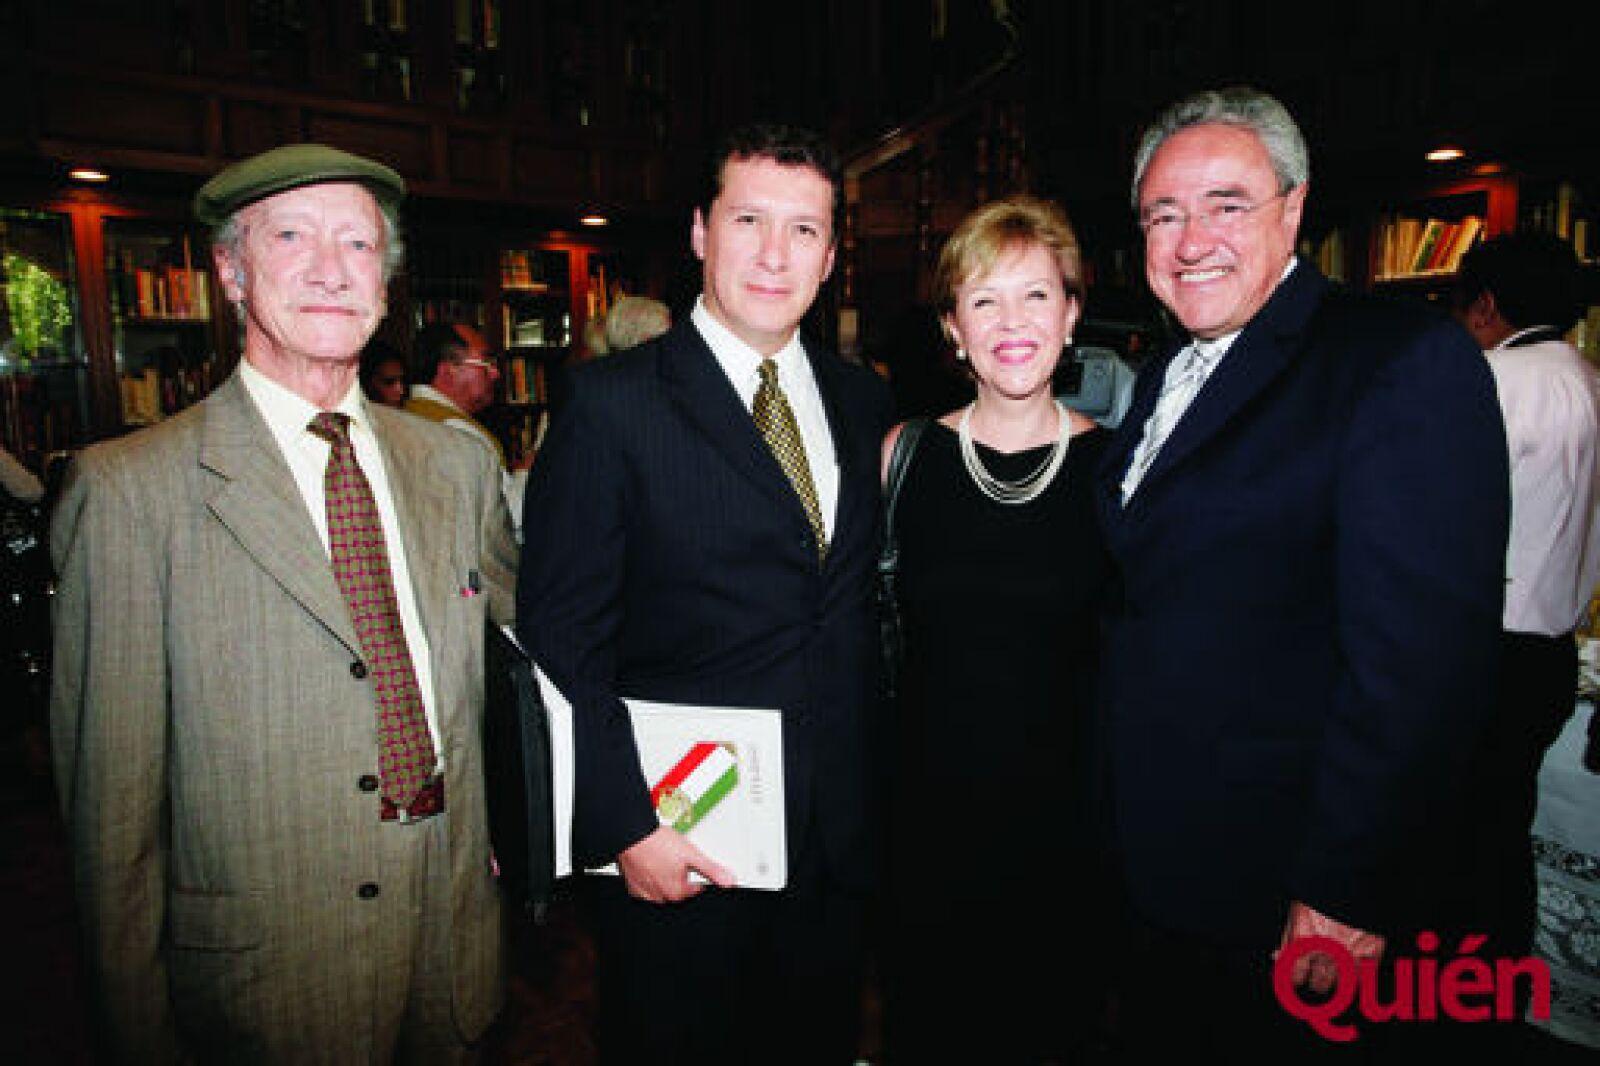 Carlos Martínez, Juan, Martínez, Sandra Reynoso, Luis Guerra